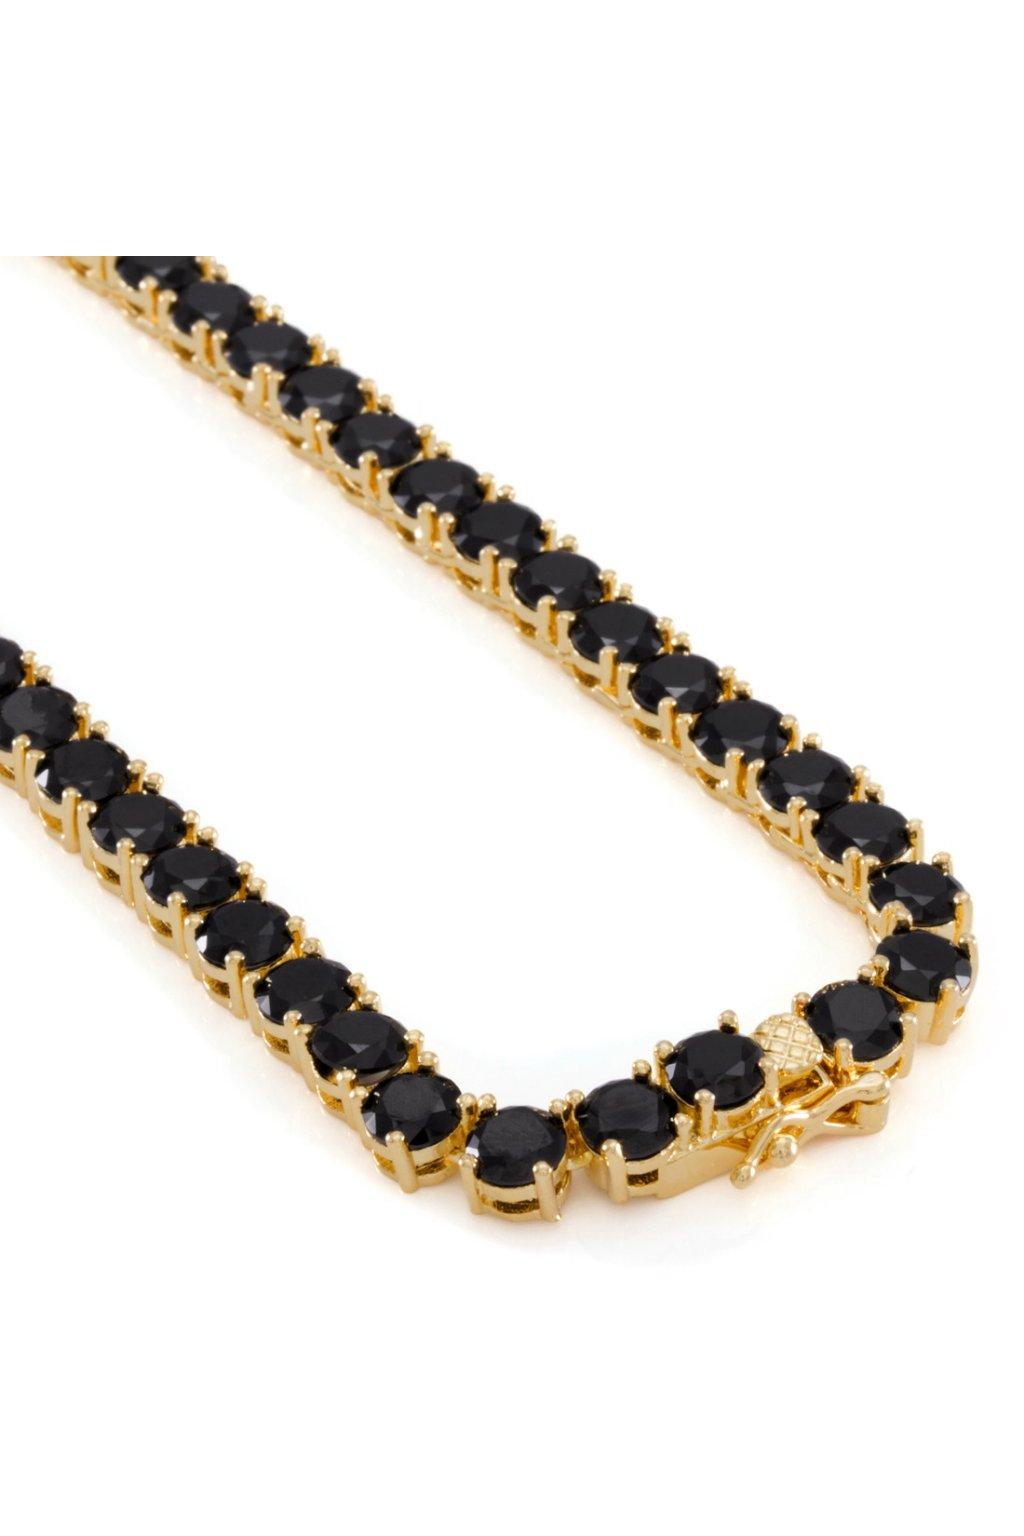 5mm náhrdelník pozlátený 14K zlatom TENNIS KING ICE - HANZI.sk ... 547db8242c7